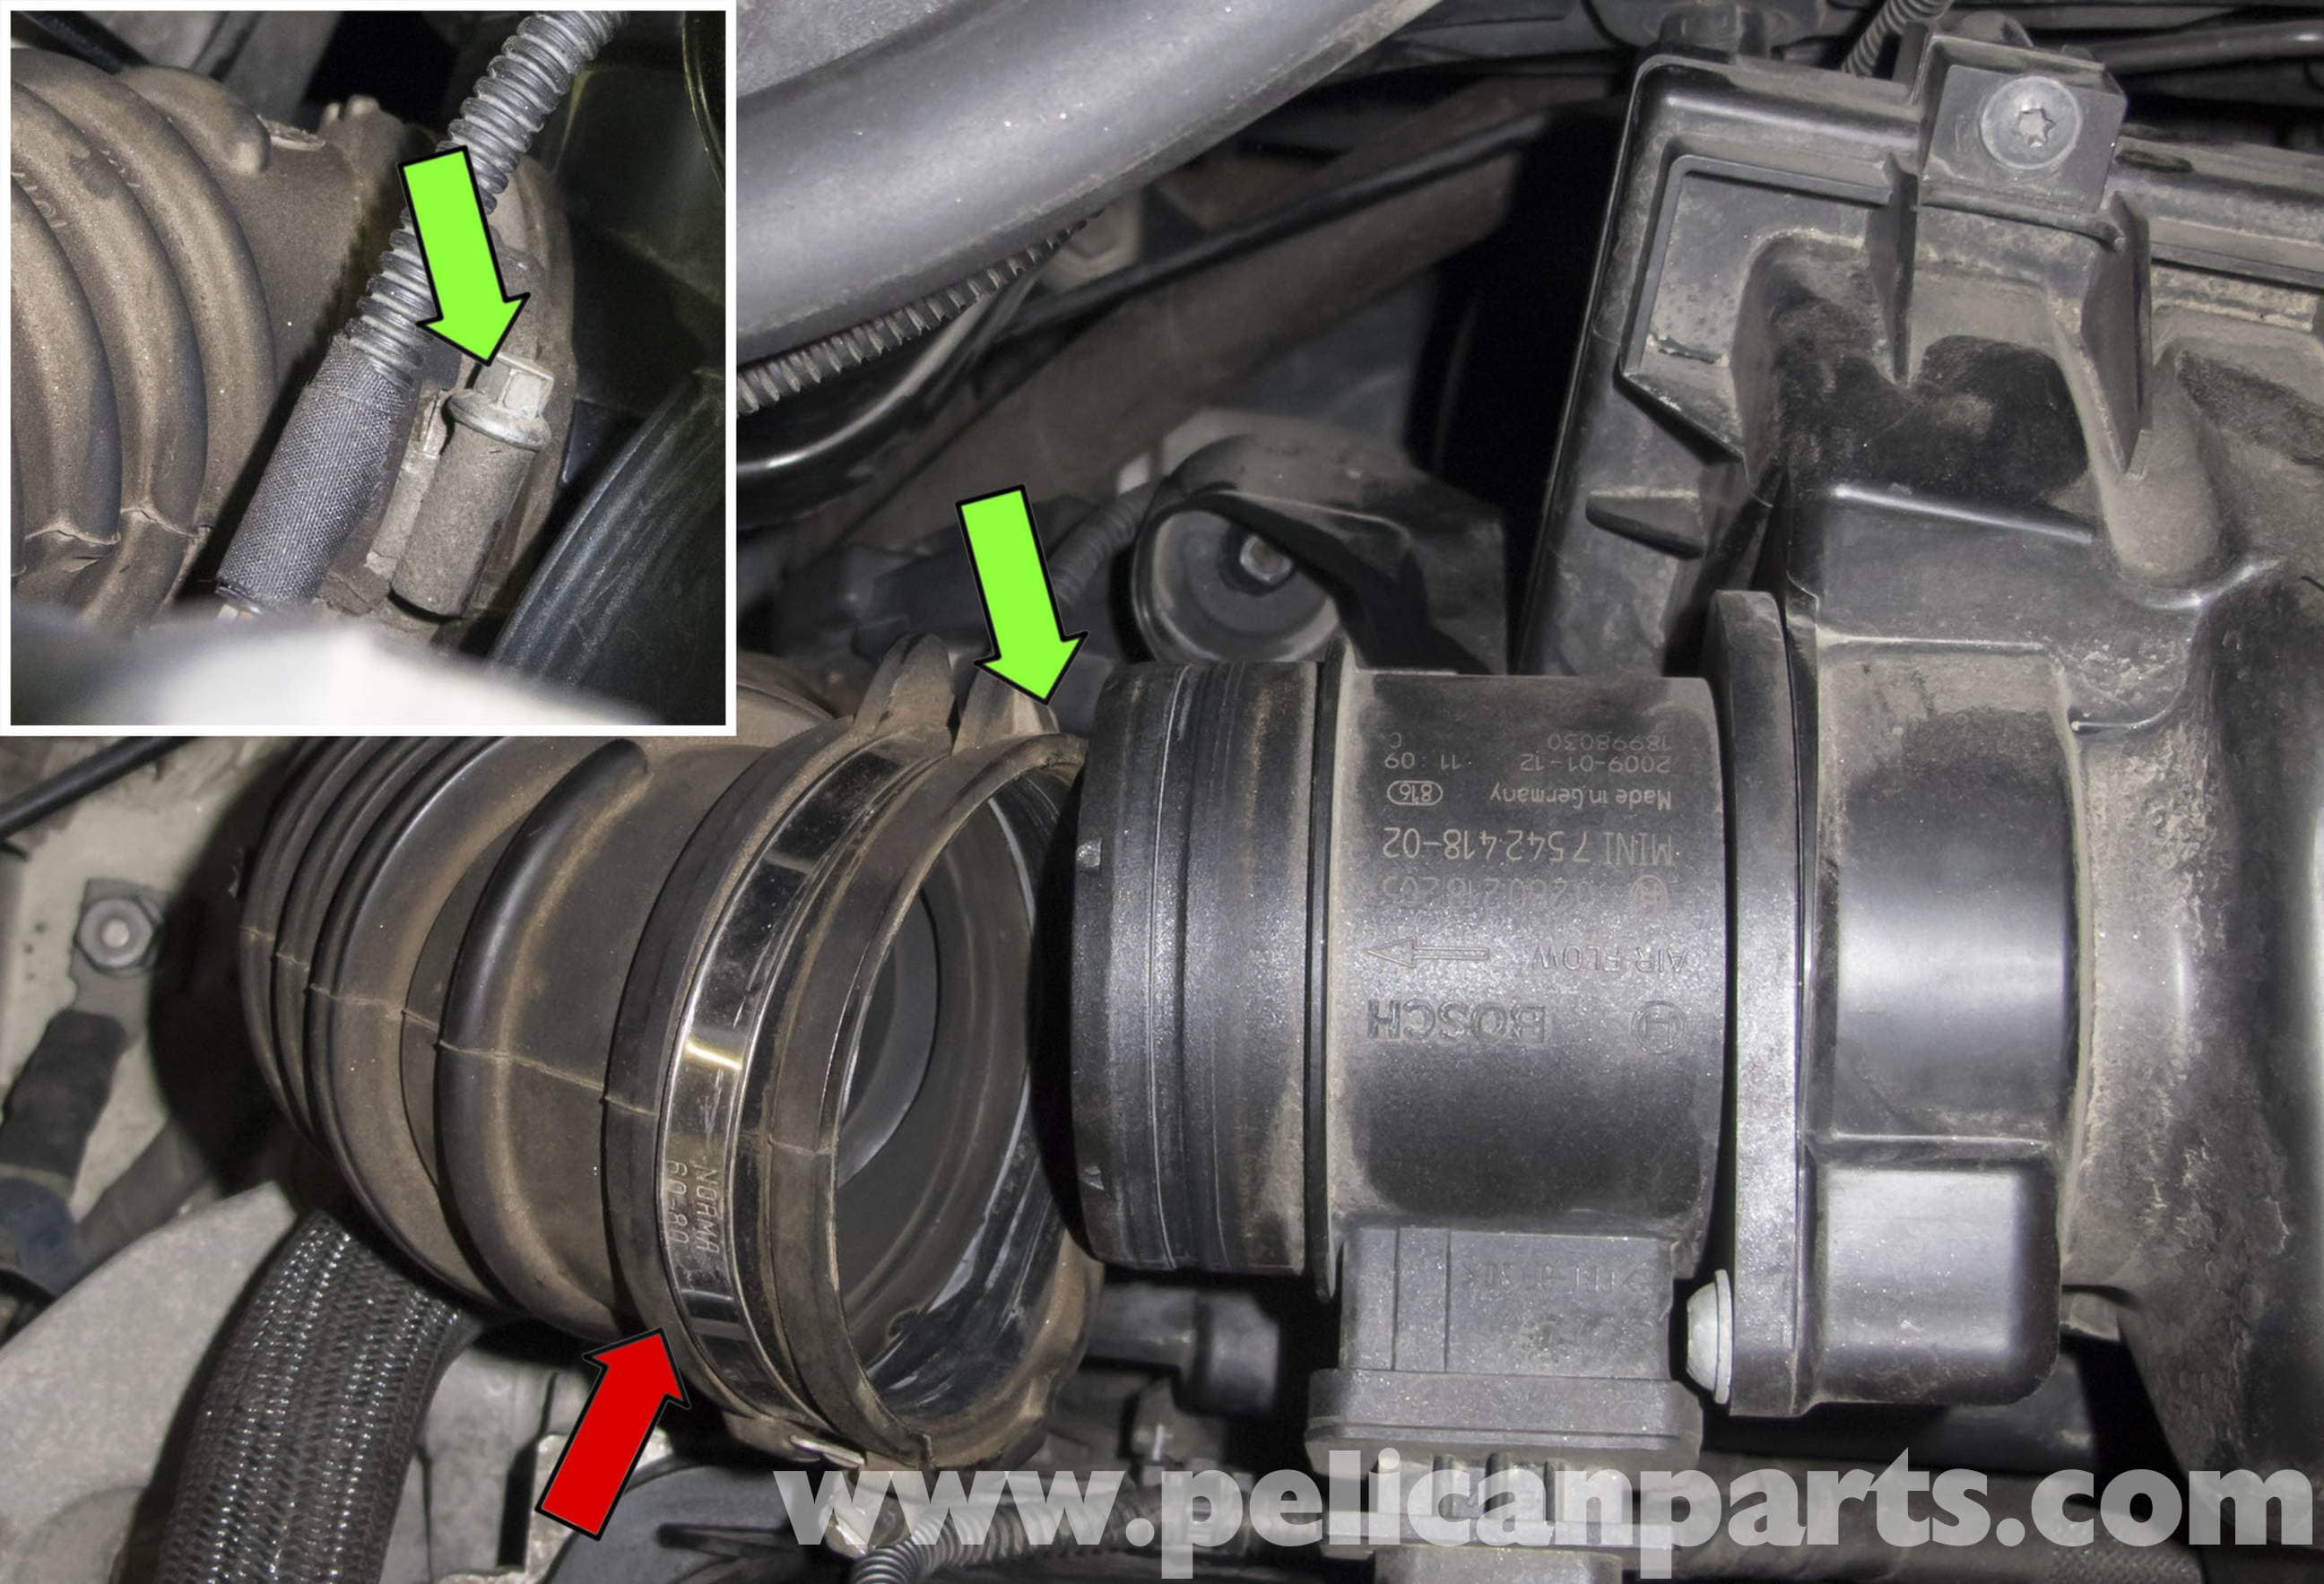 MINI Cooper R56 Throttle Housing Replacement (2007-2011